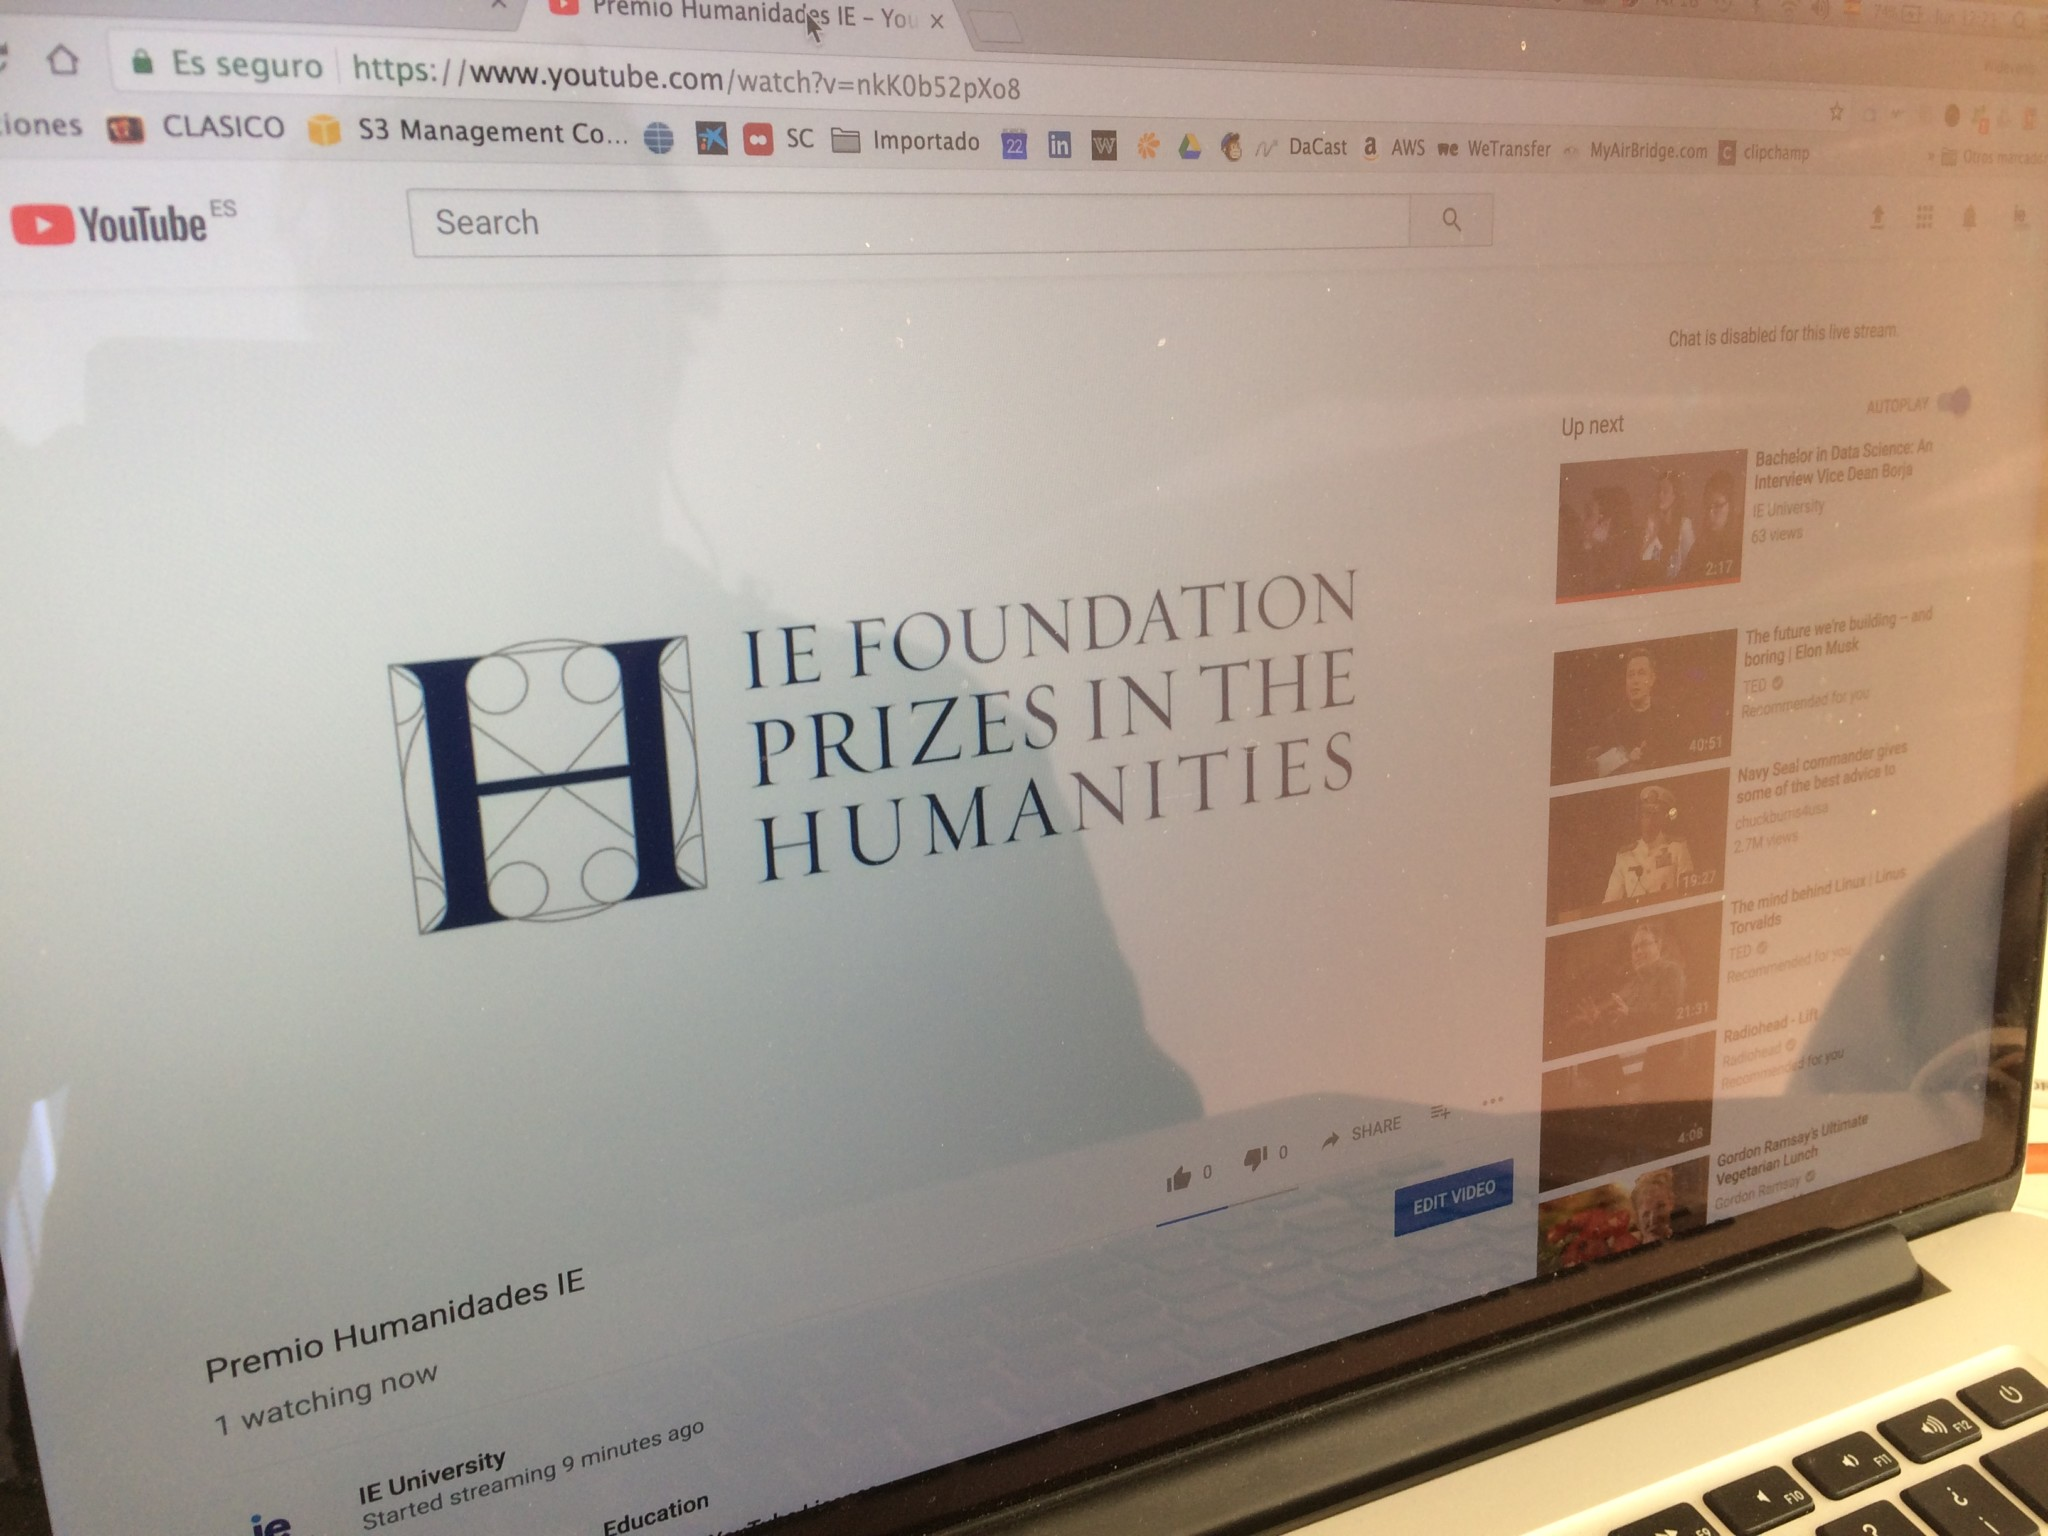 Live Streaming Premio Humanidades IE 2